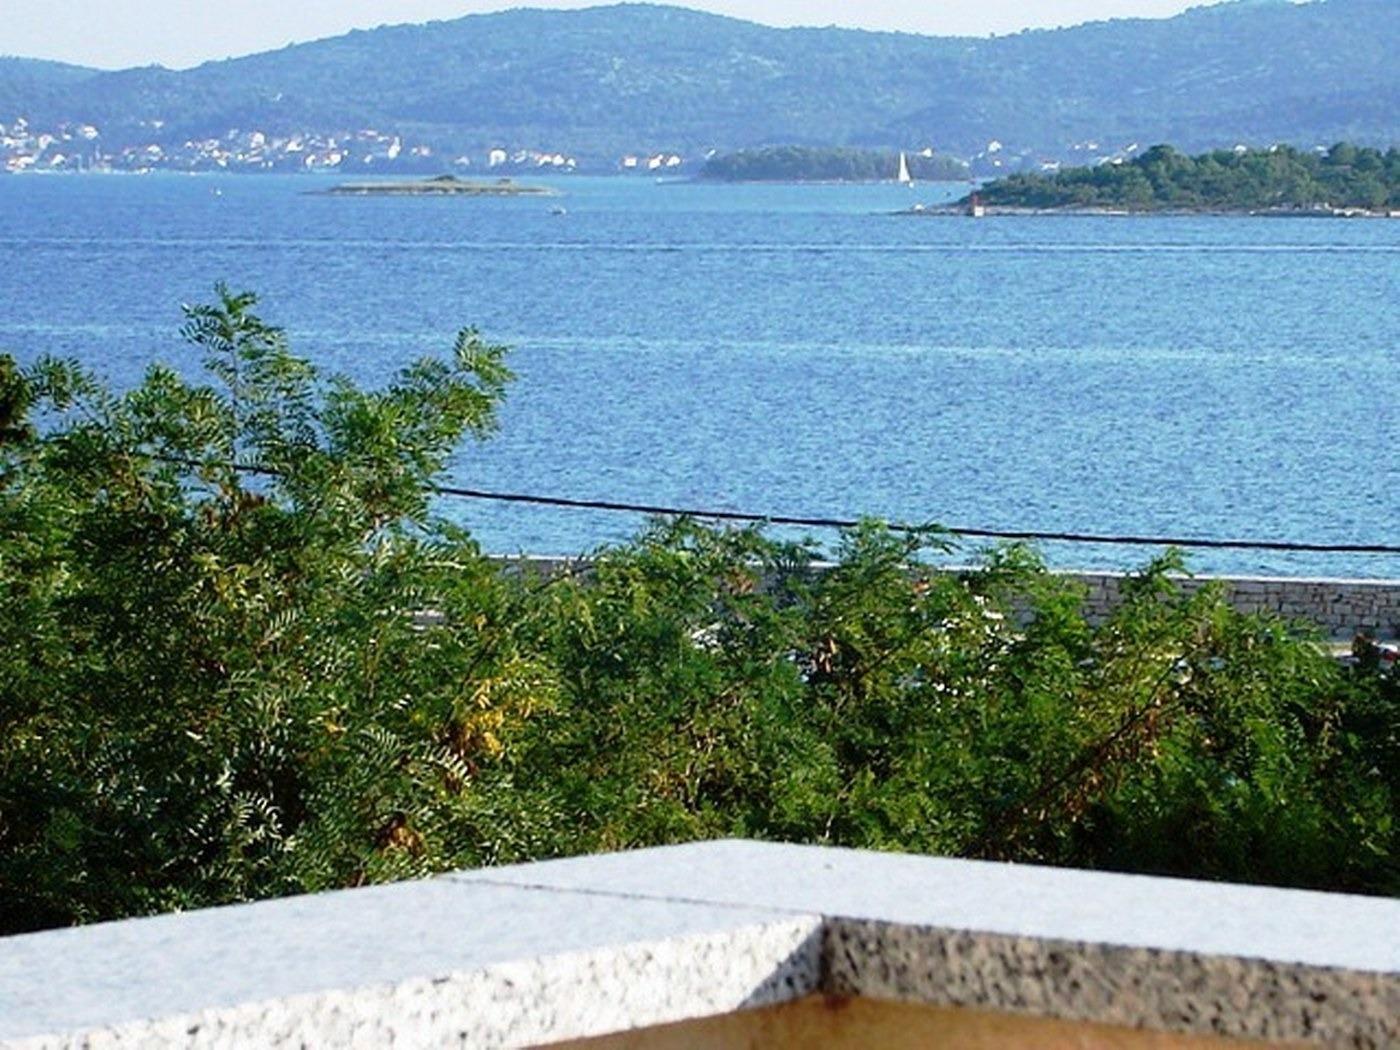 Ferienwohnung Ivan A1(4+1) - Turanj (918633), Turanj, , Dalmatien, Kroatien, Bild 11